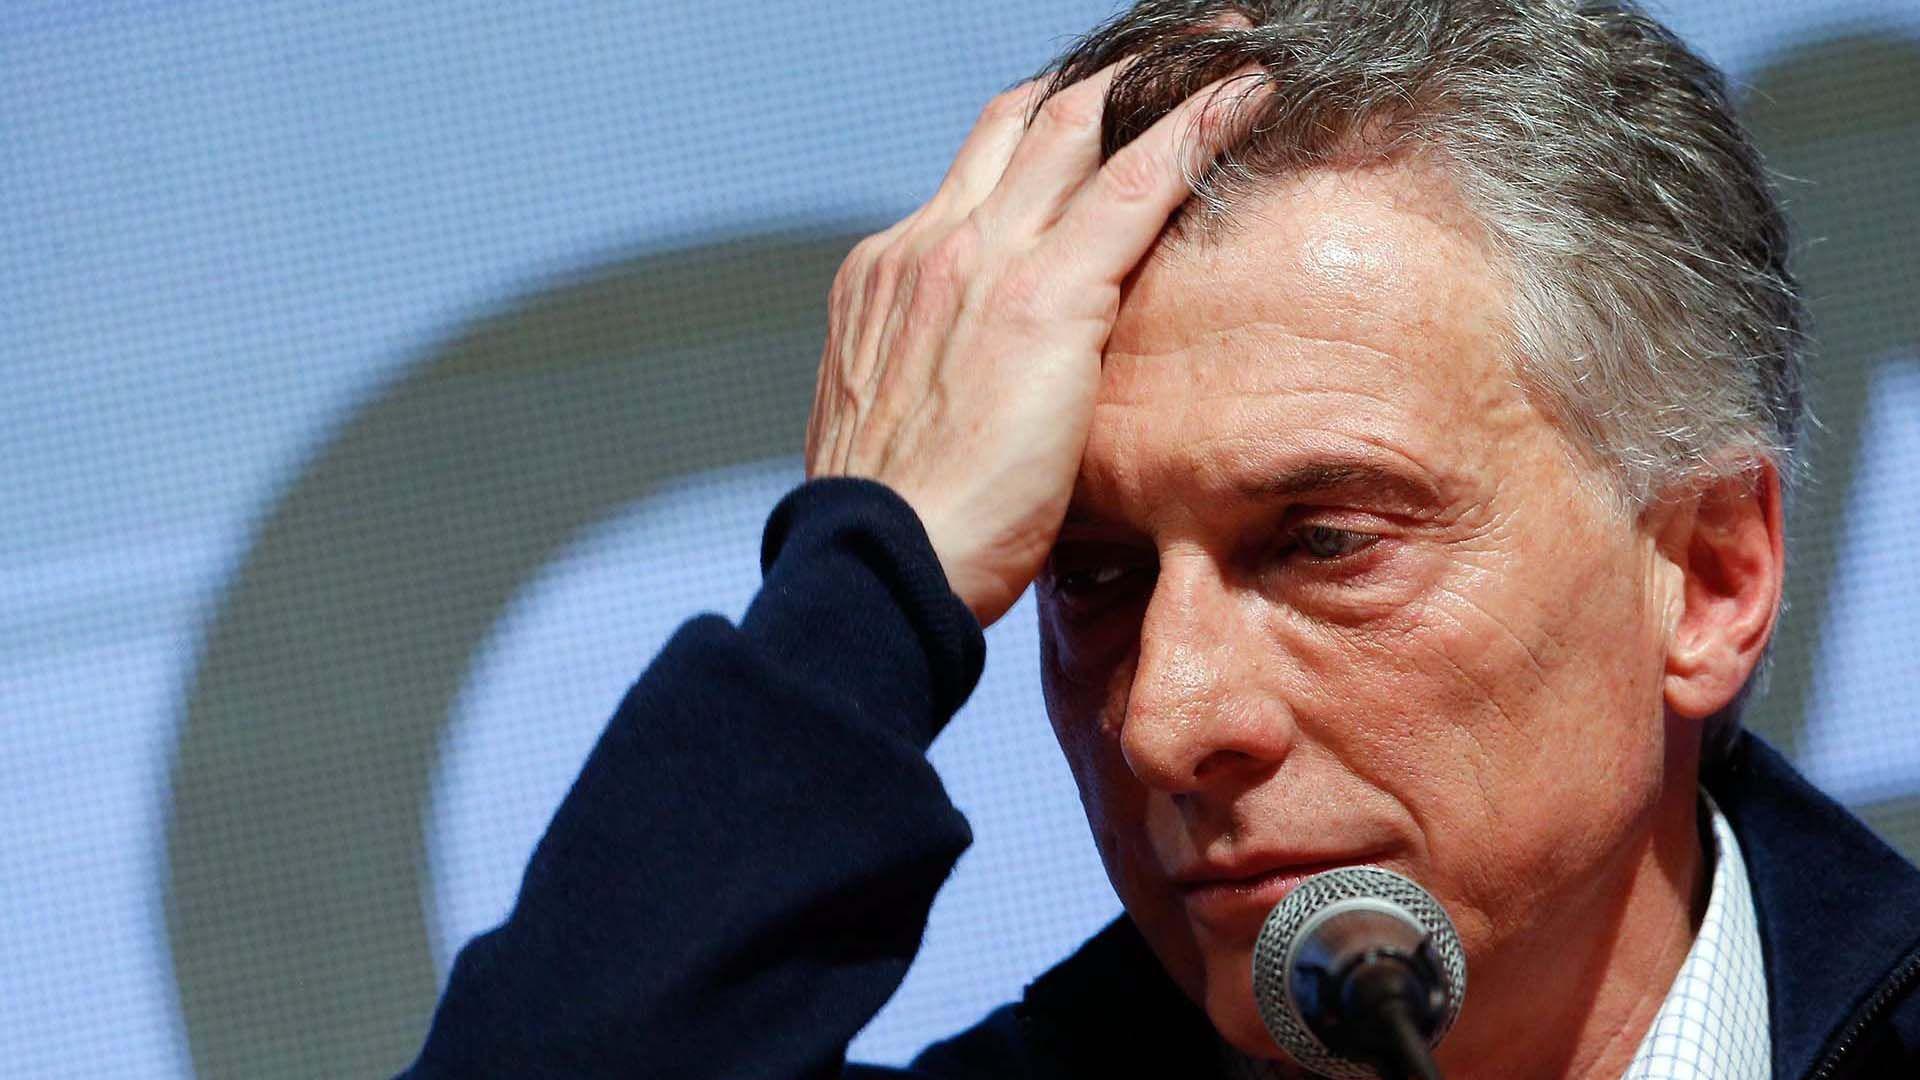 En su regreso, Macri atacó a Cristina, se victimizó y negó el espionaje ilegal